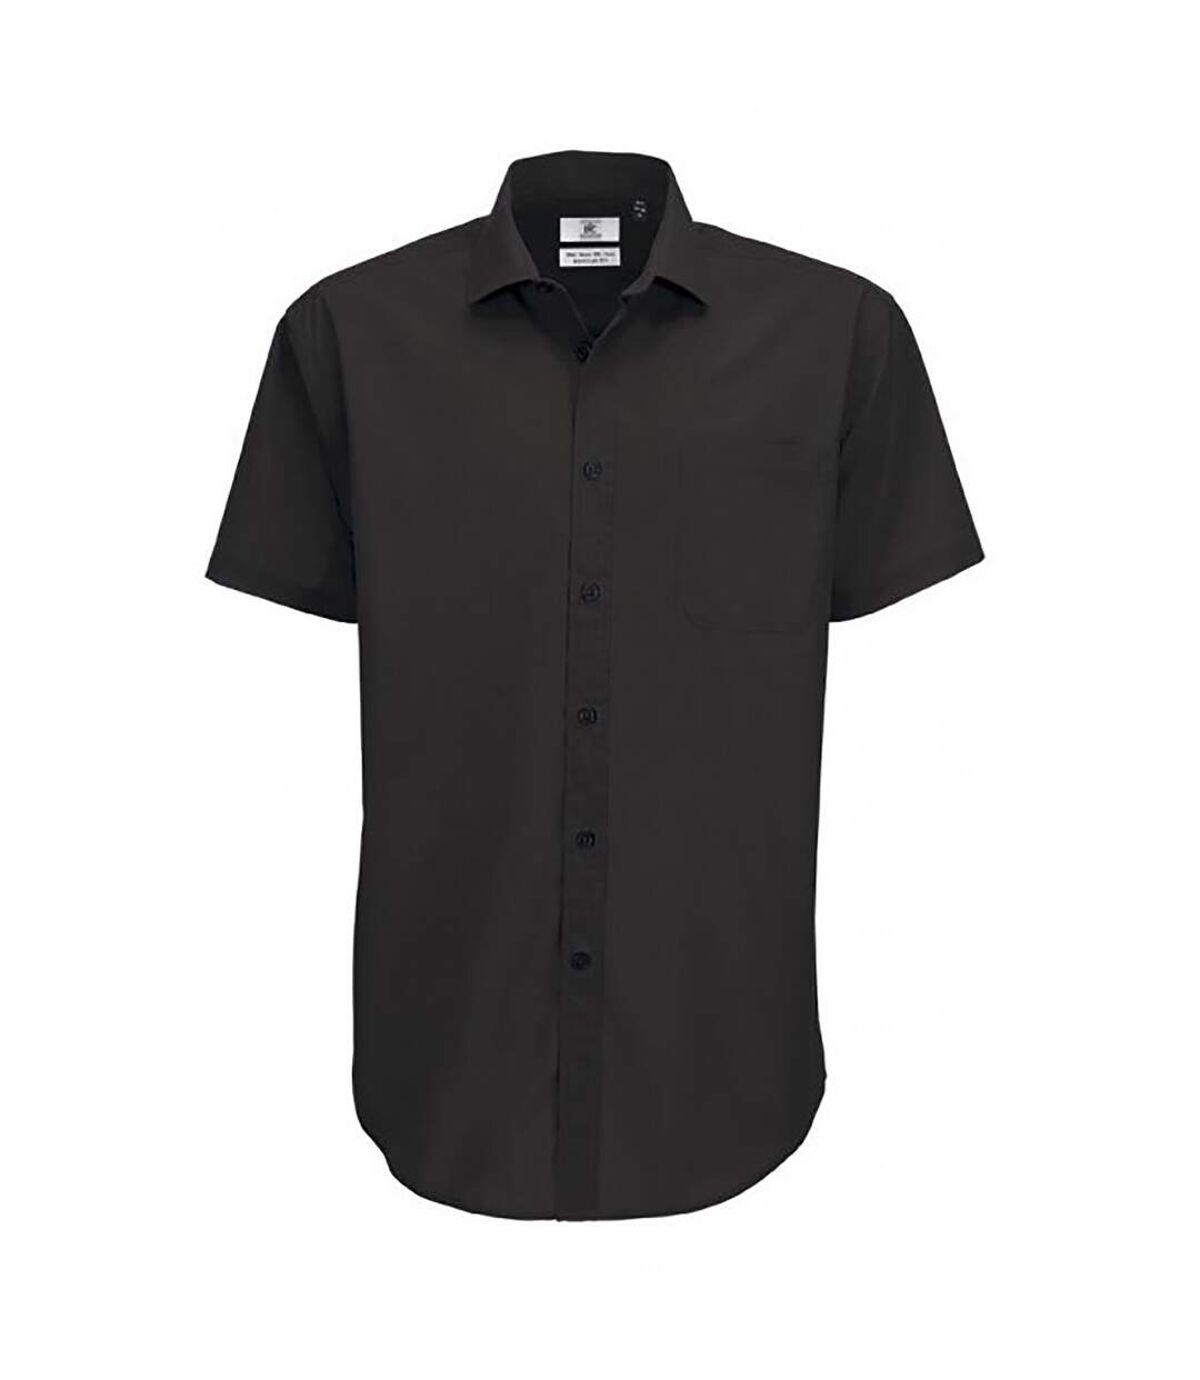 B&C Mens Smart Short Sleeve Shirt / Mens Shirts (Navy Blue) - UTBC112